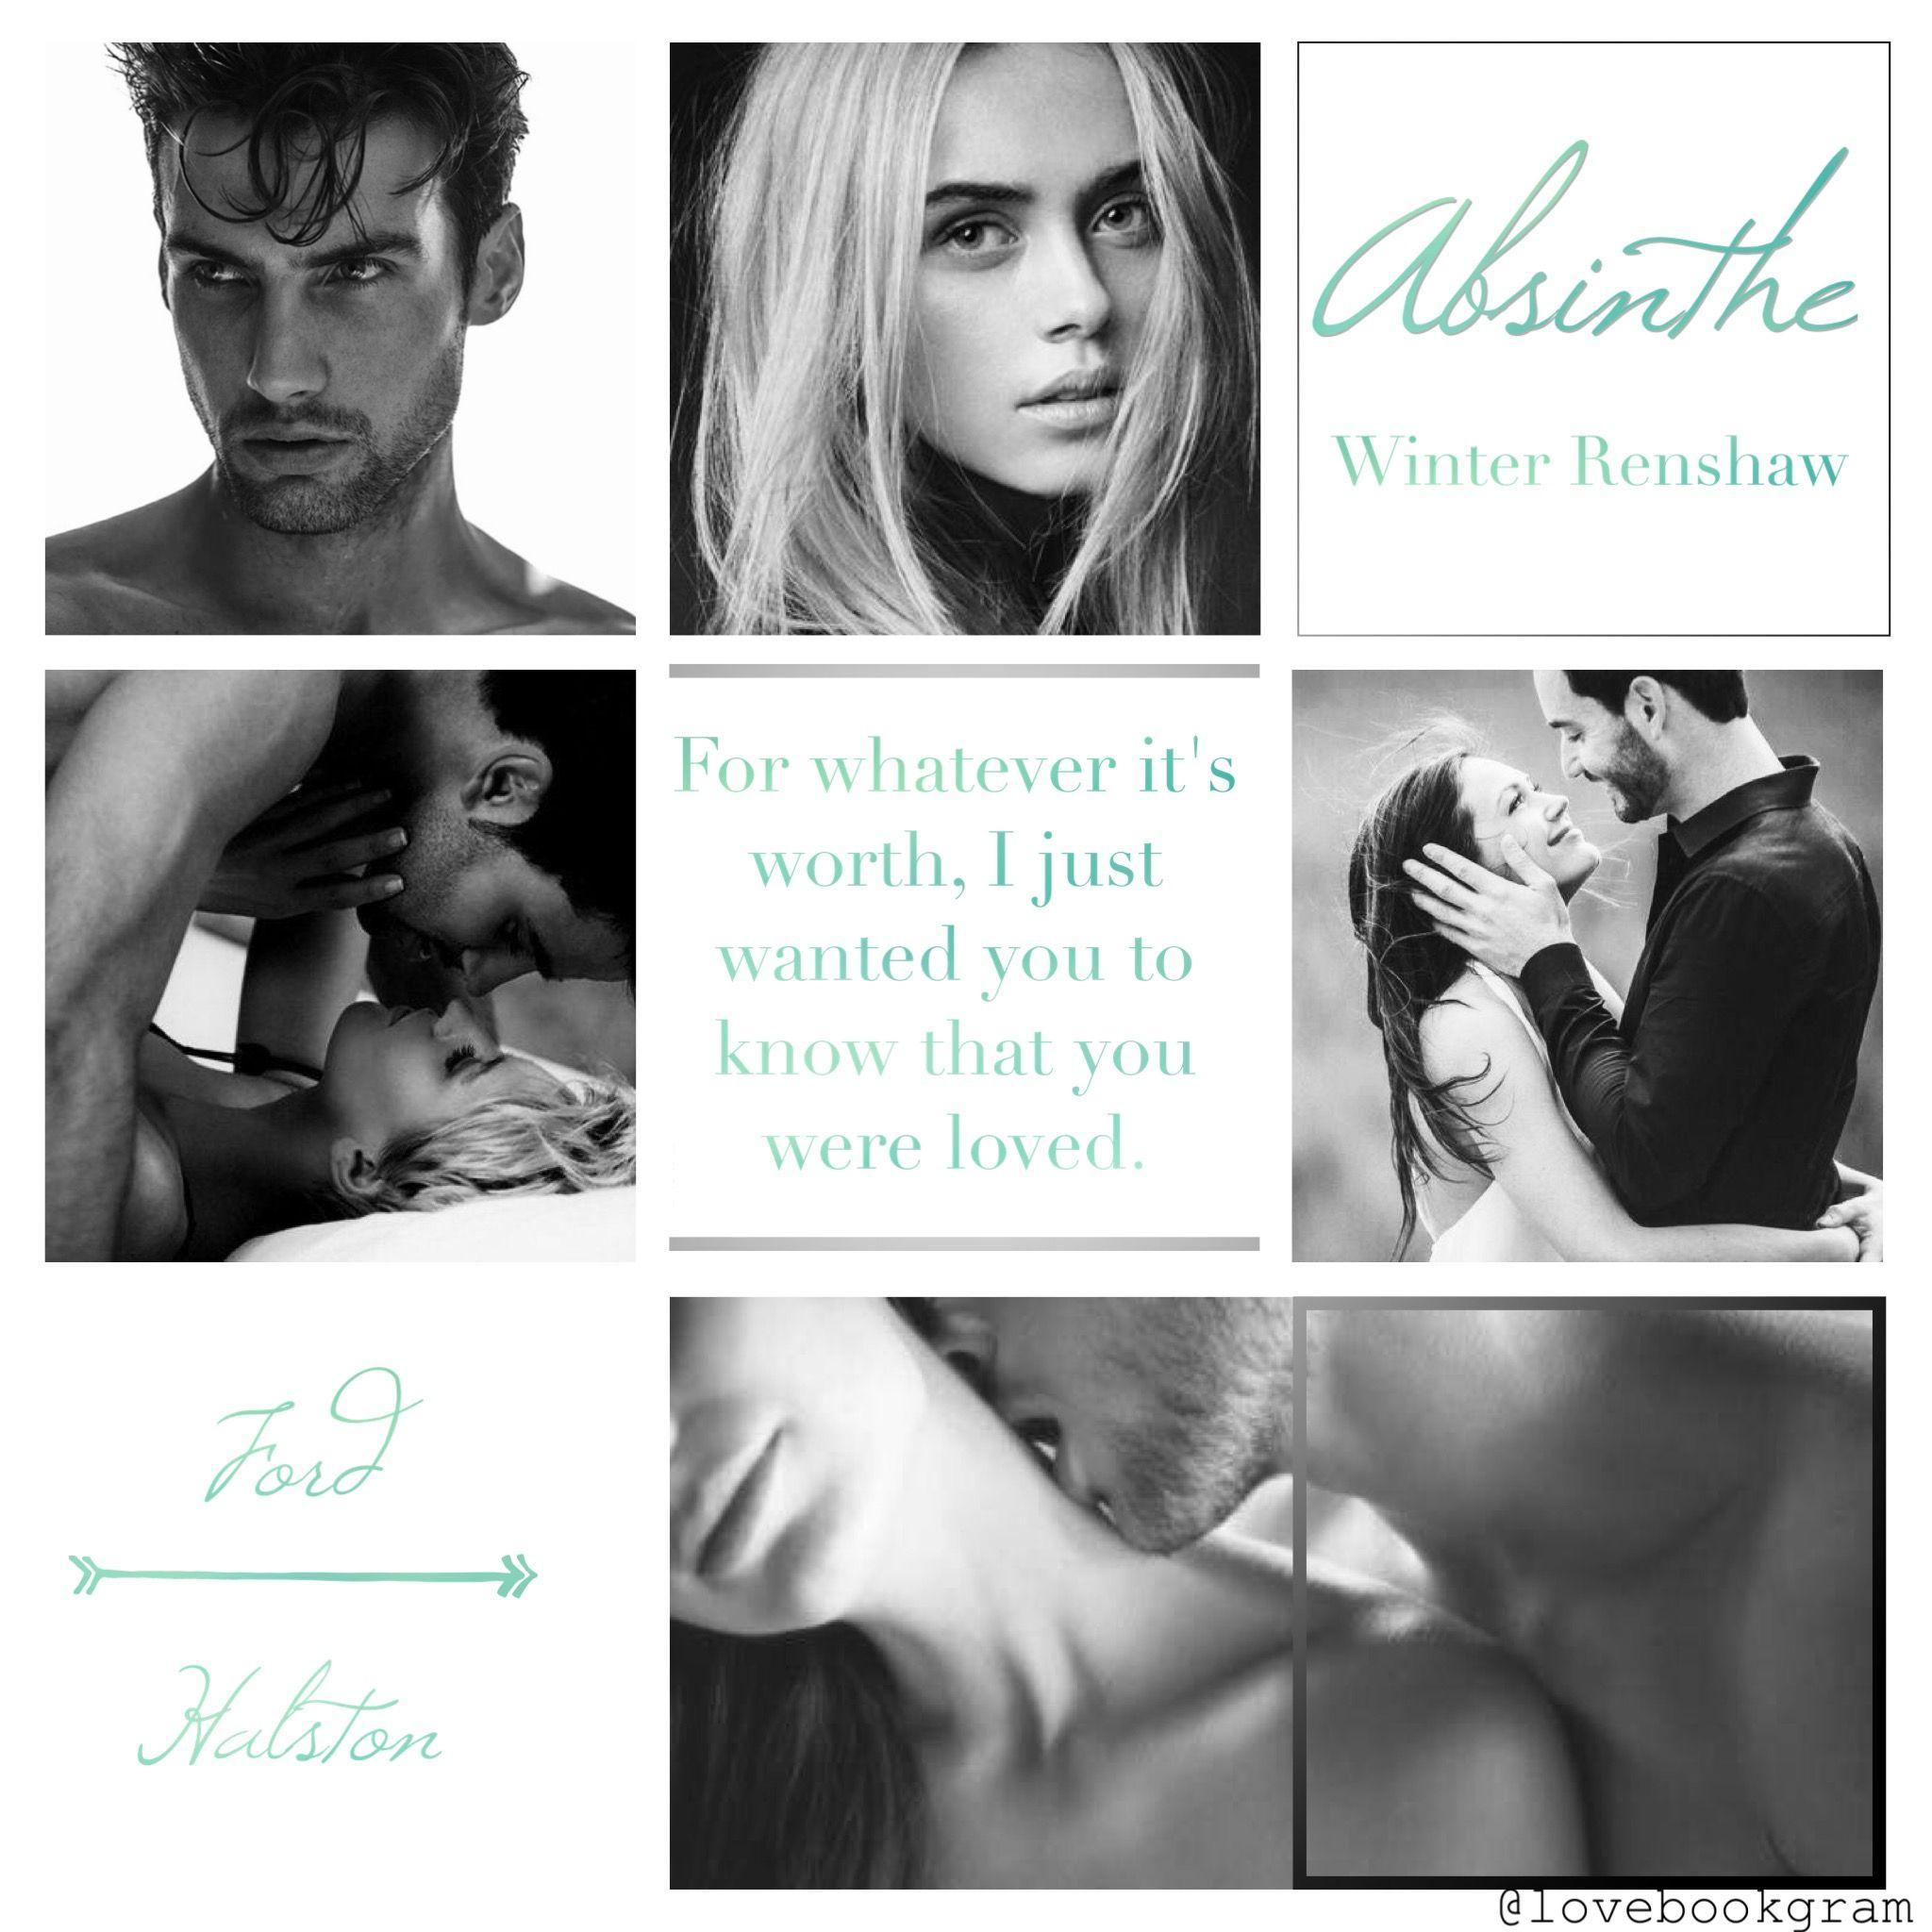 Absinthe by Winter Renshaw | m y - b o o k s | Movie posters